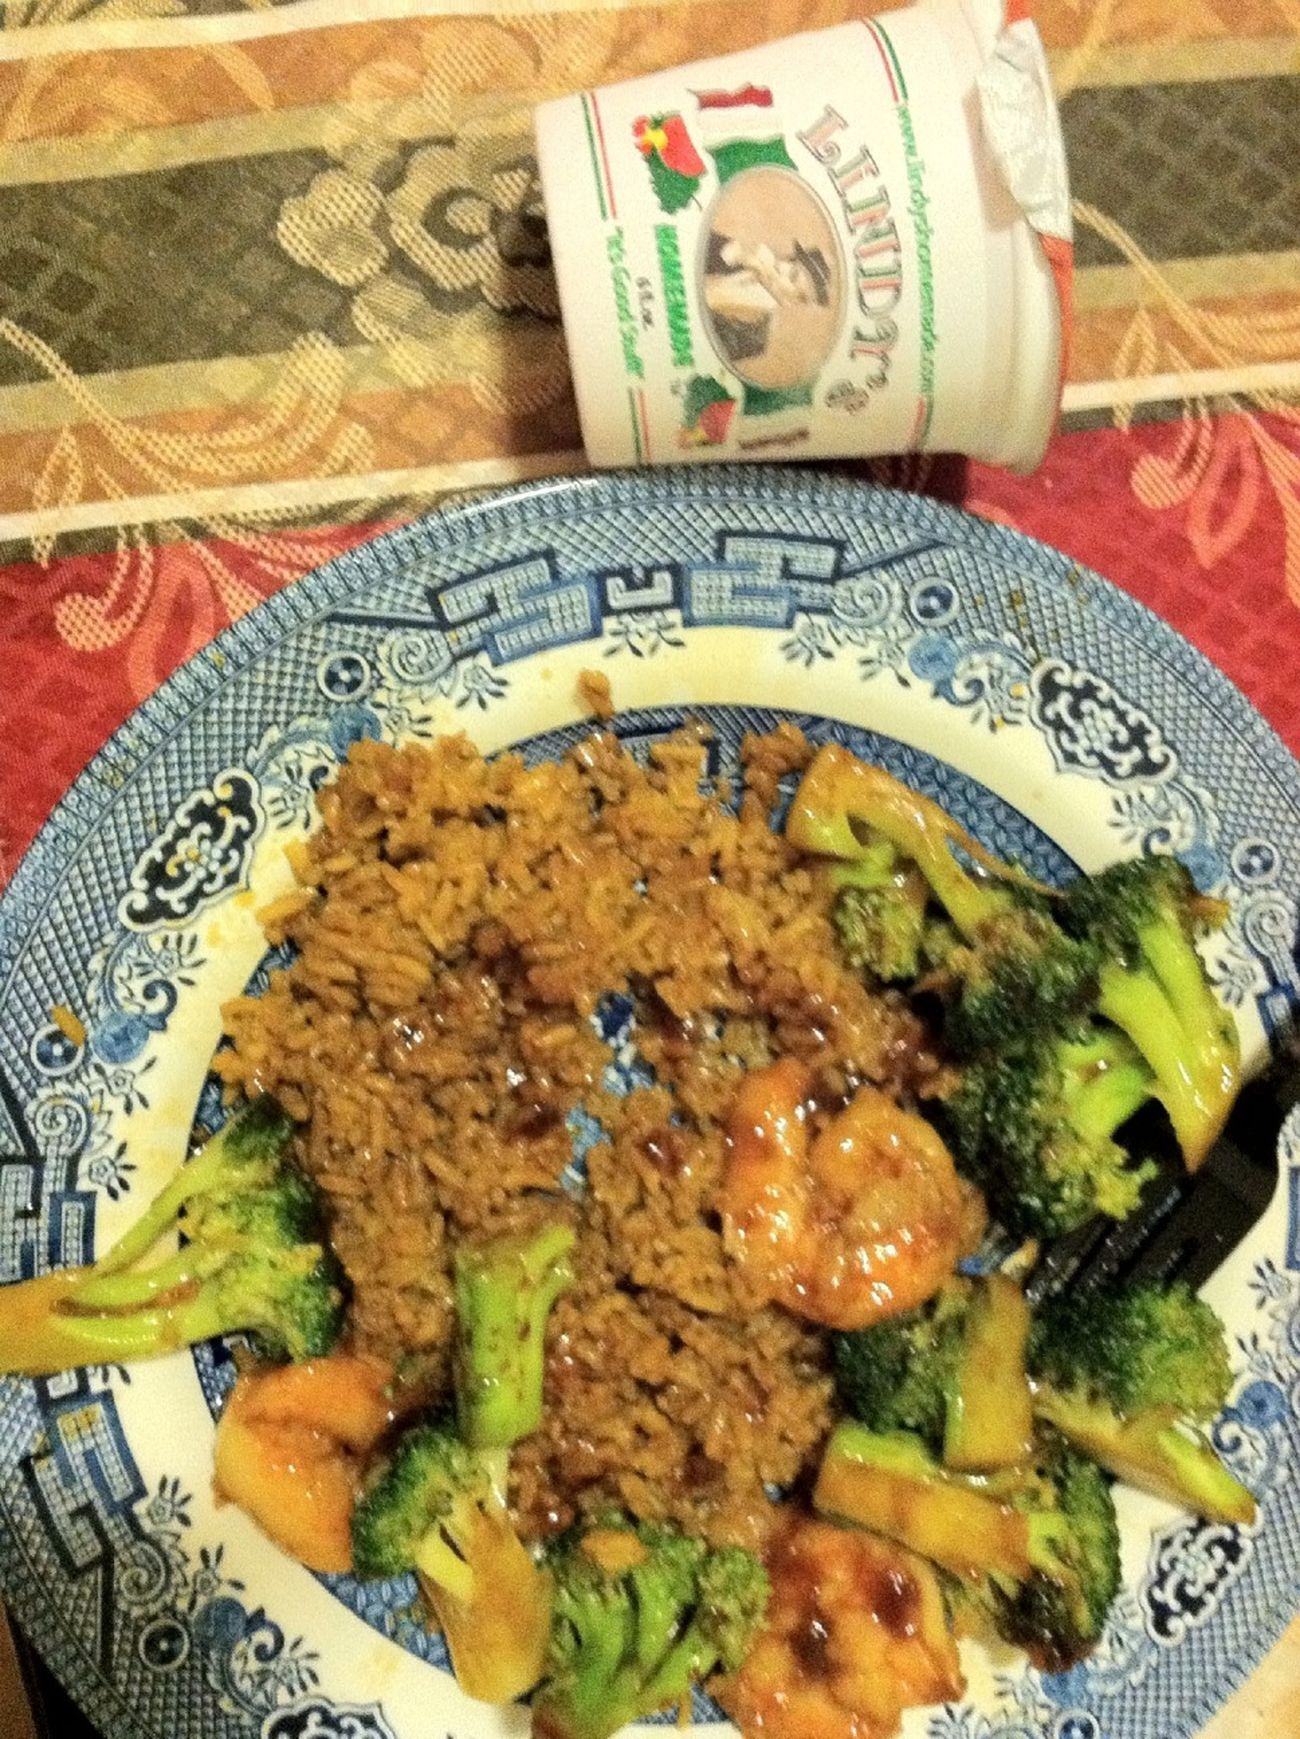 #Lastnight #Dinner #Shrimp #Broccoli #Fried Rice